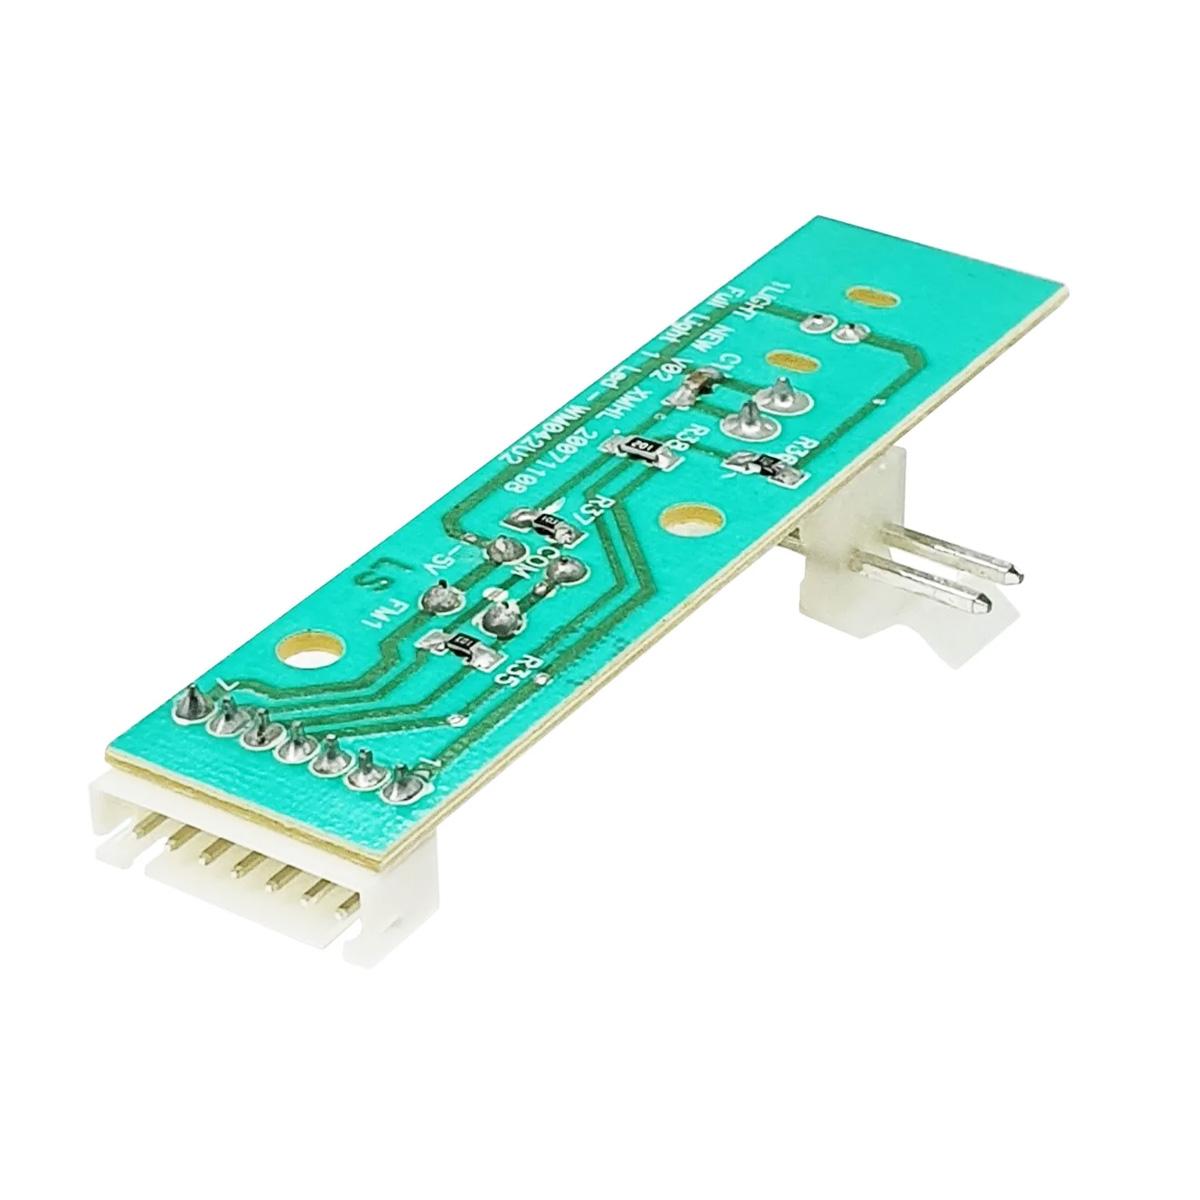 PLACA INTERFACE LAVADORA ELECTROLUX LT60 64800629 M&S